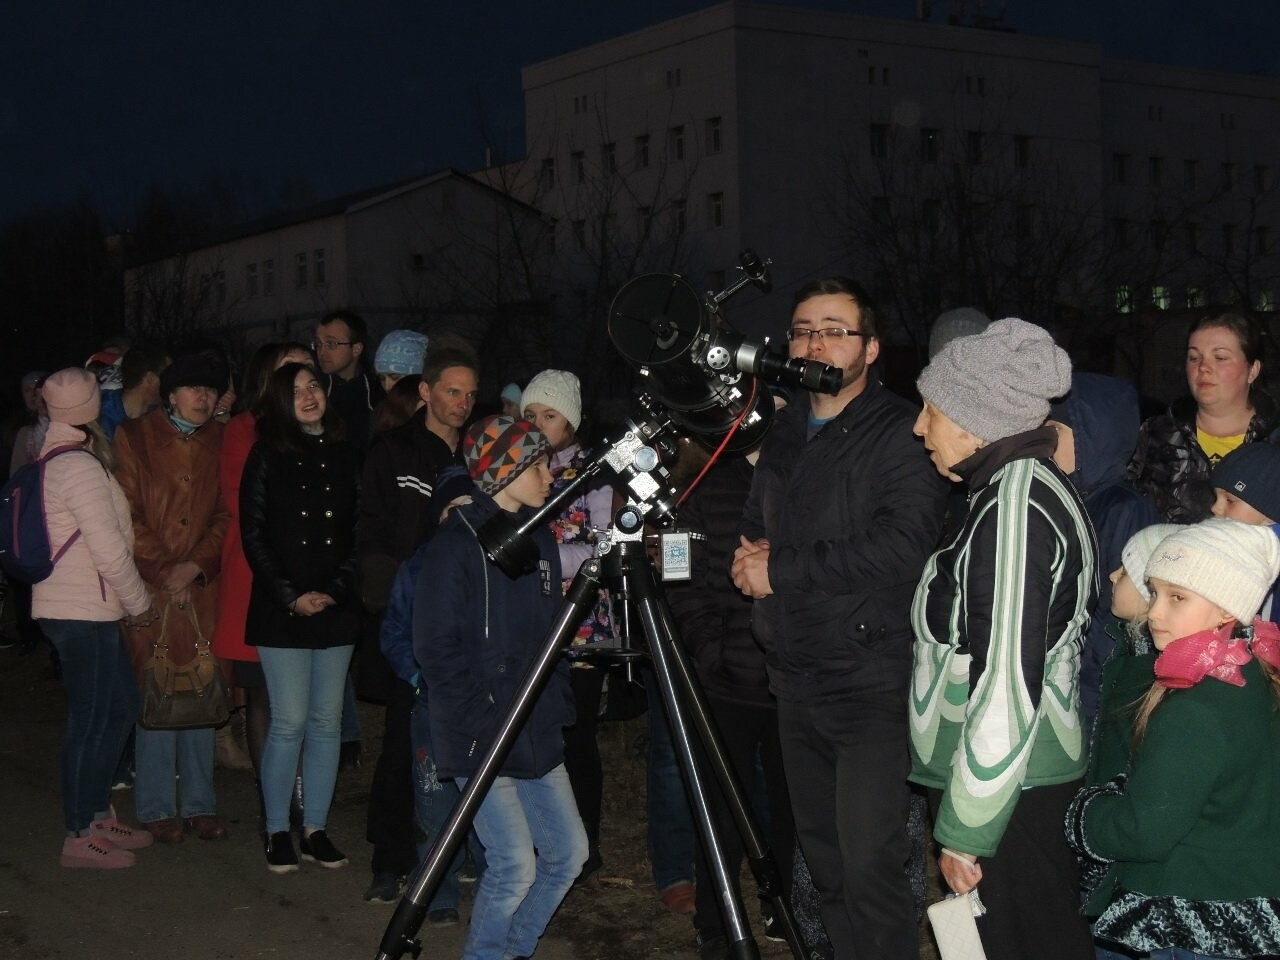 Тамбовчане отметили День космонавтики вместе с порталом Go68 и «Радио Дача», фото-5